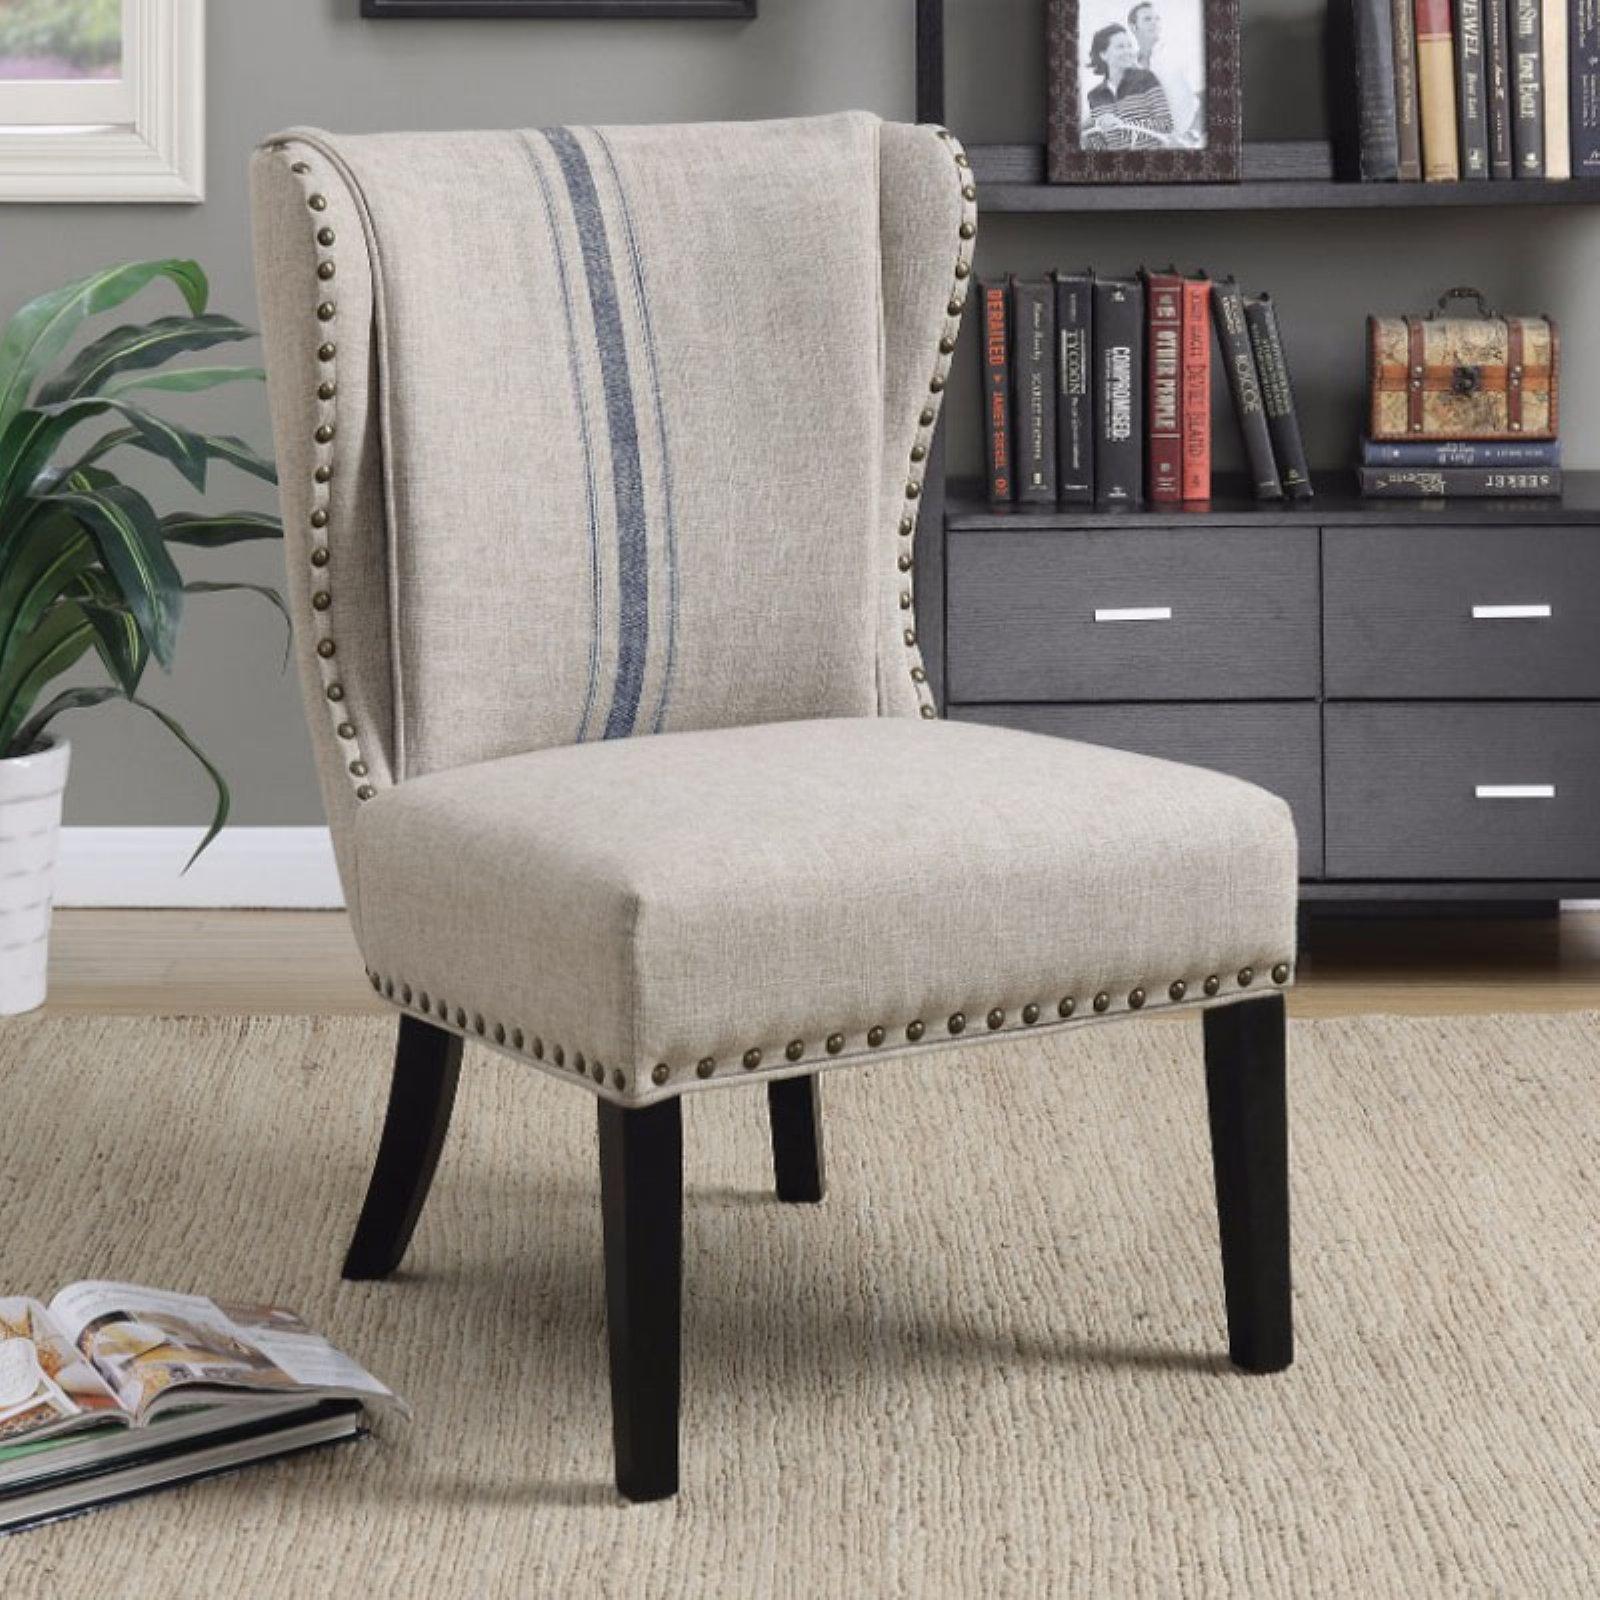 Benzara vintage inspired accent chair